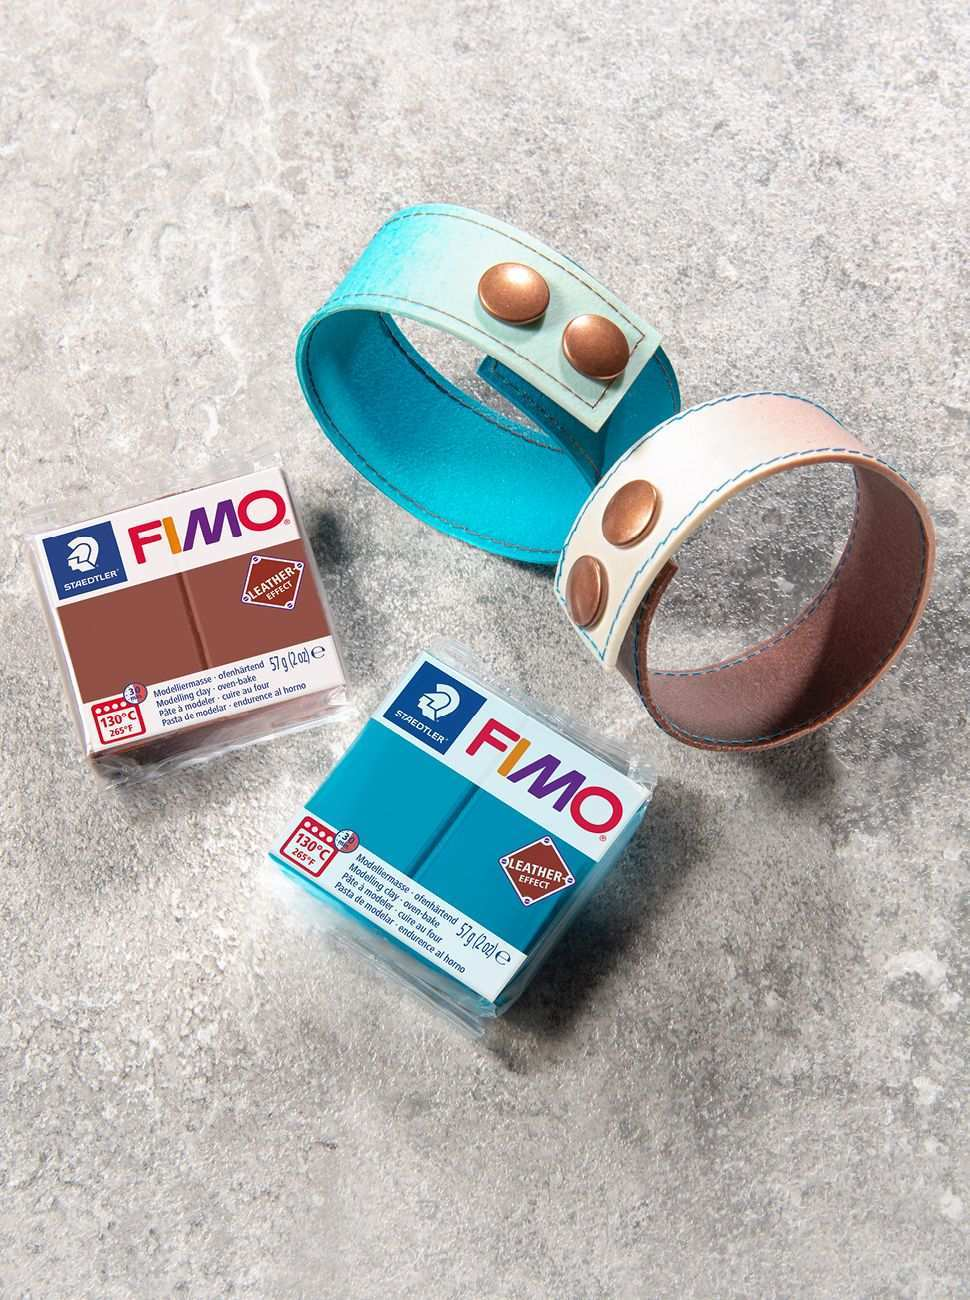 Fimo Leather Effect I Am Creative Leder Tutorial Polymer Knetmasse Fimo Polymer Clay